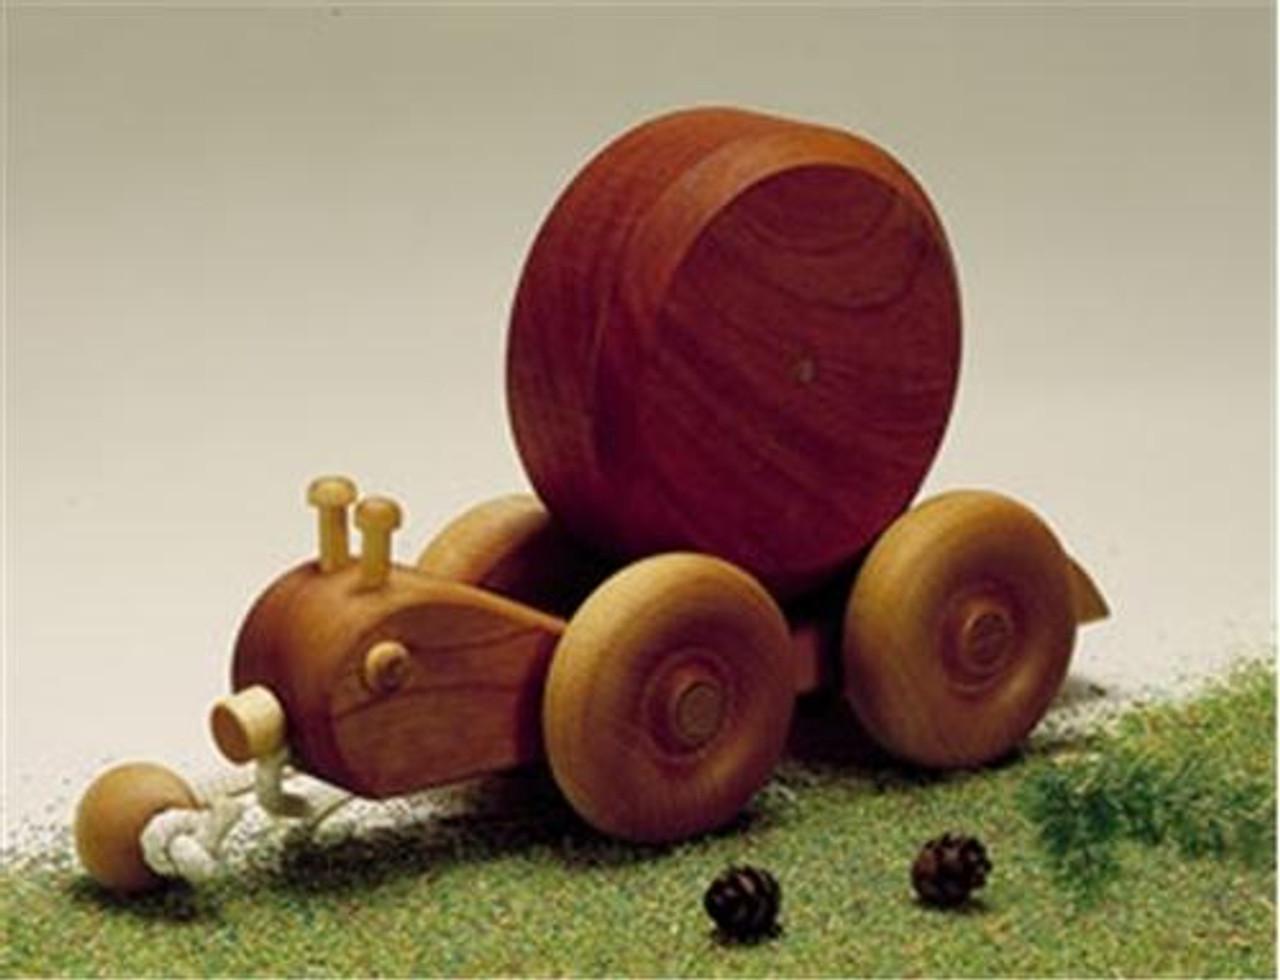 Cherry Tree Toys Silo The Snail Parts Kit